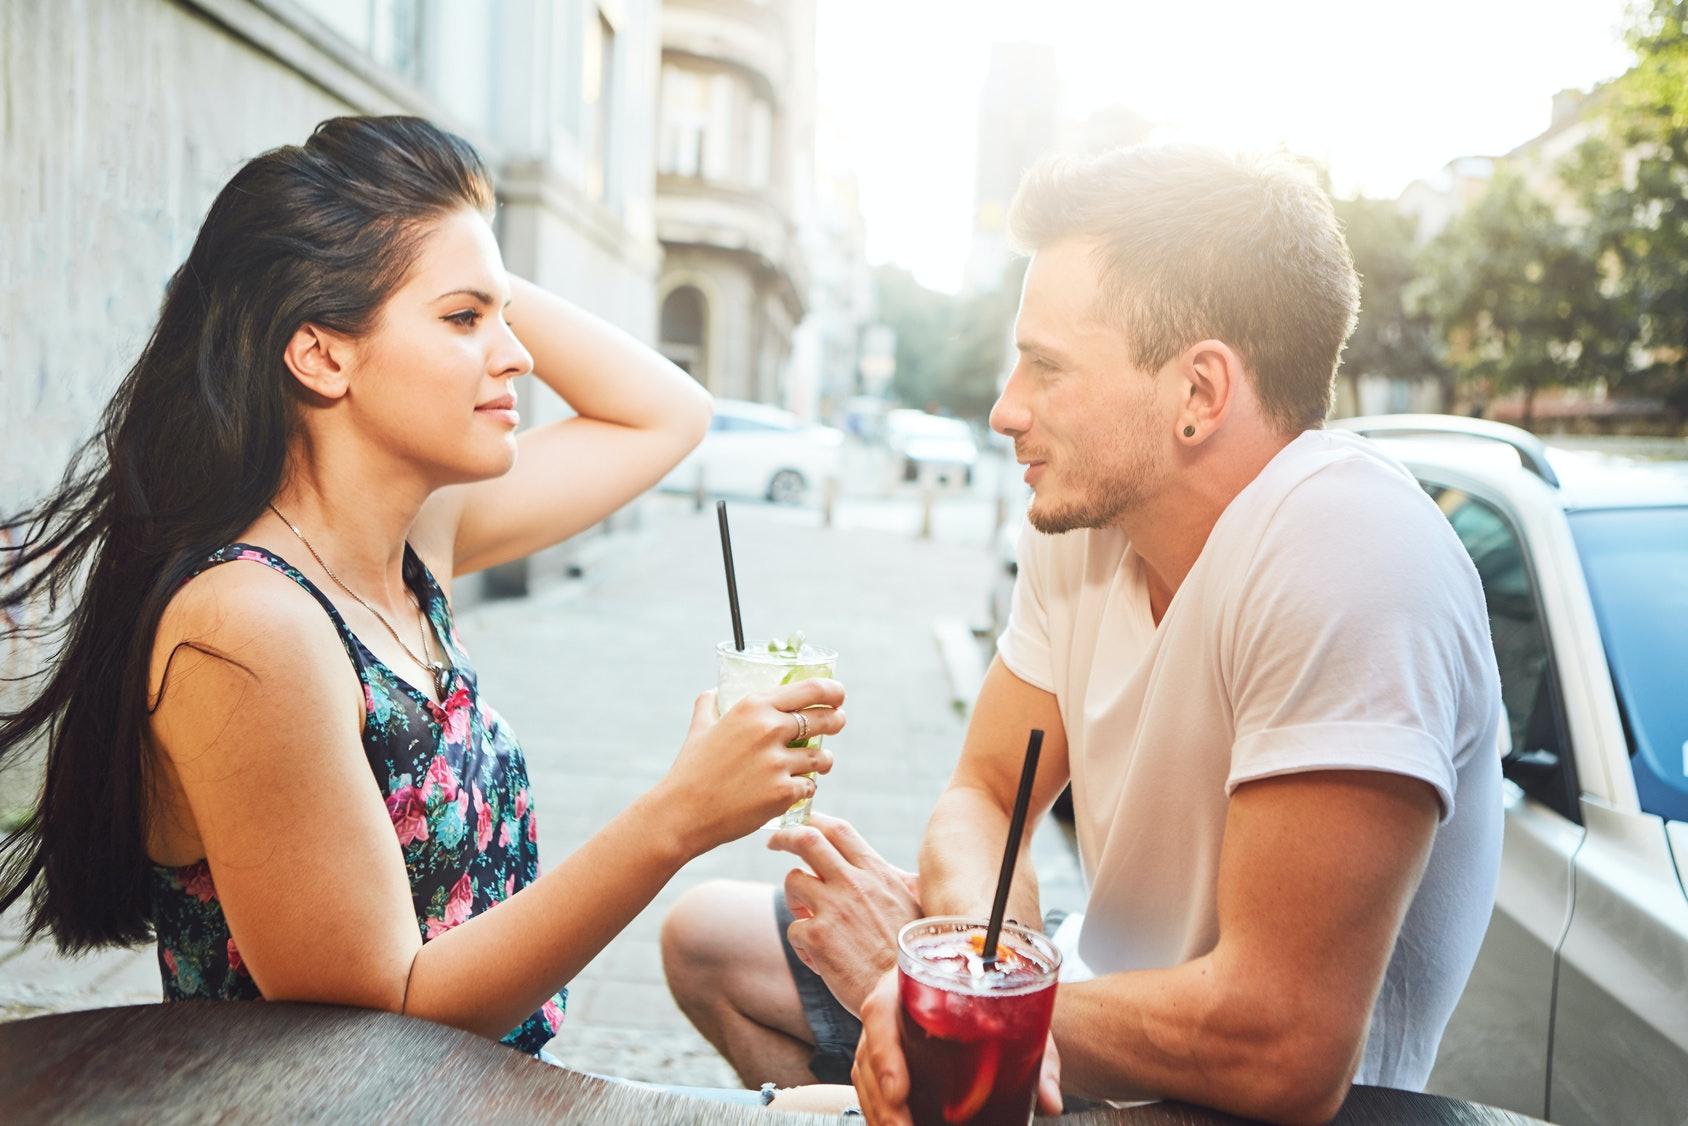 Gimnasio el hontanar online dating